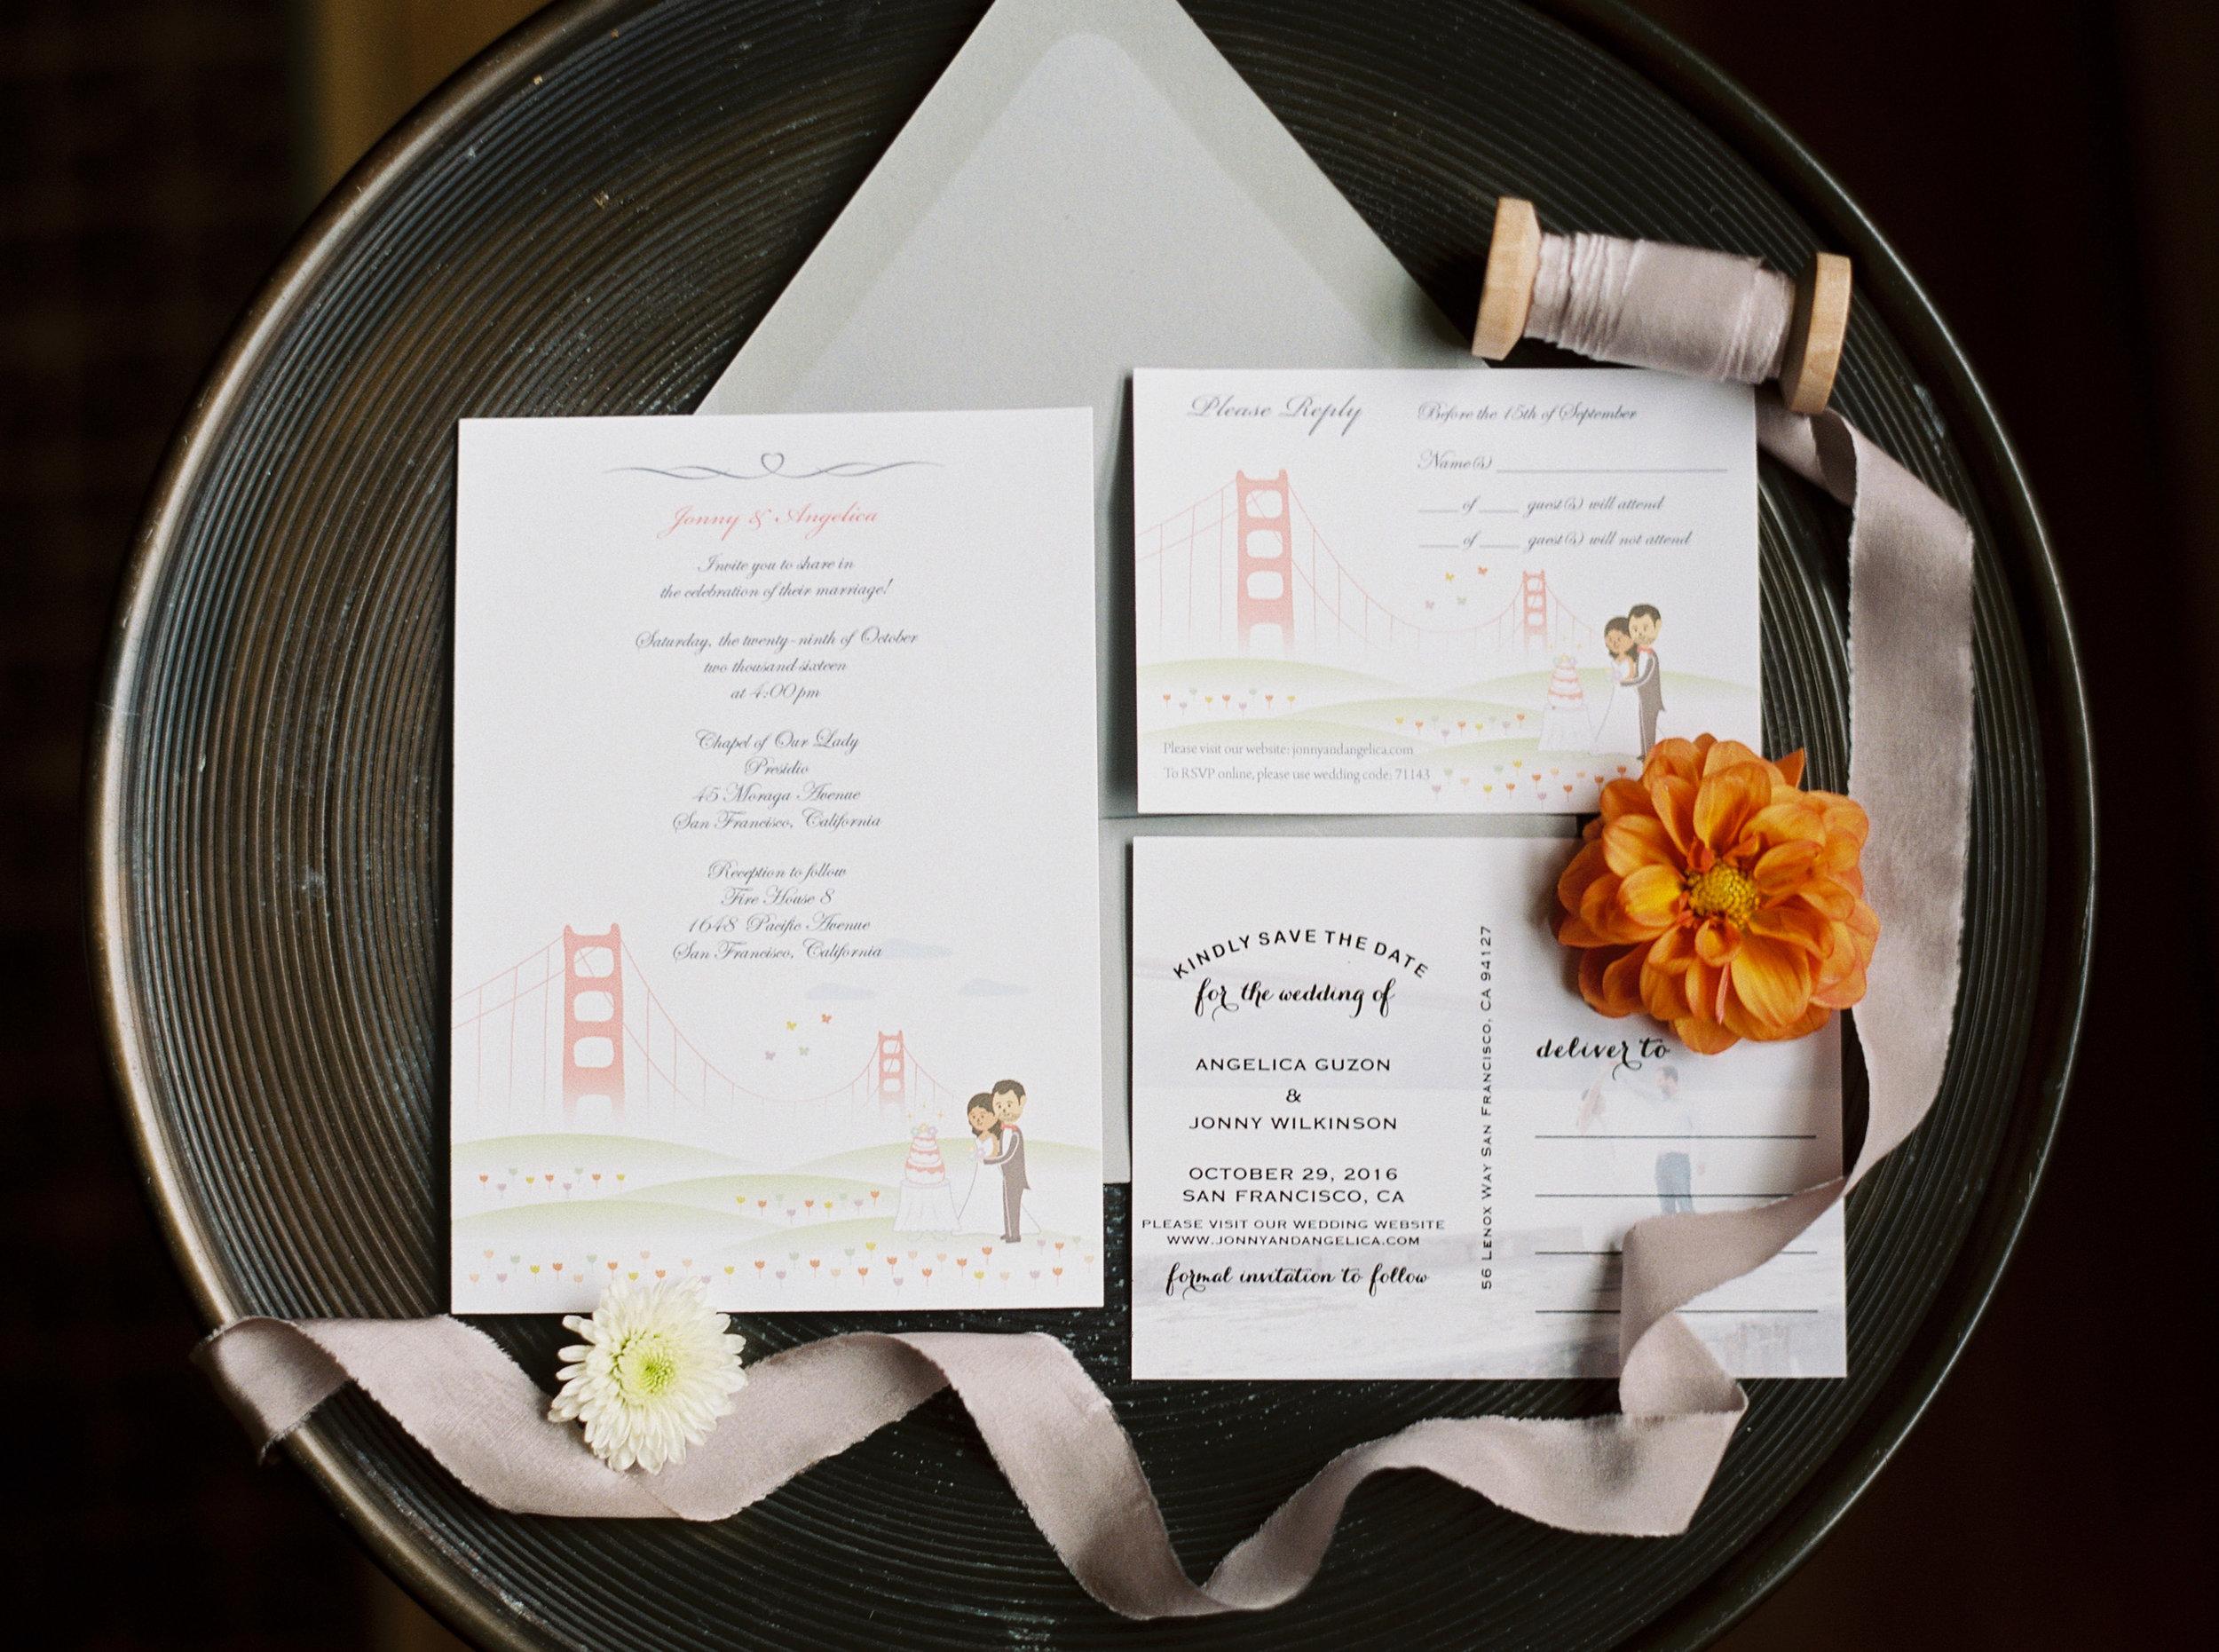 blush-inspired-wedding-at-the-presidio-in-san-francisco.jpg